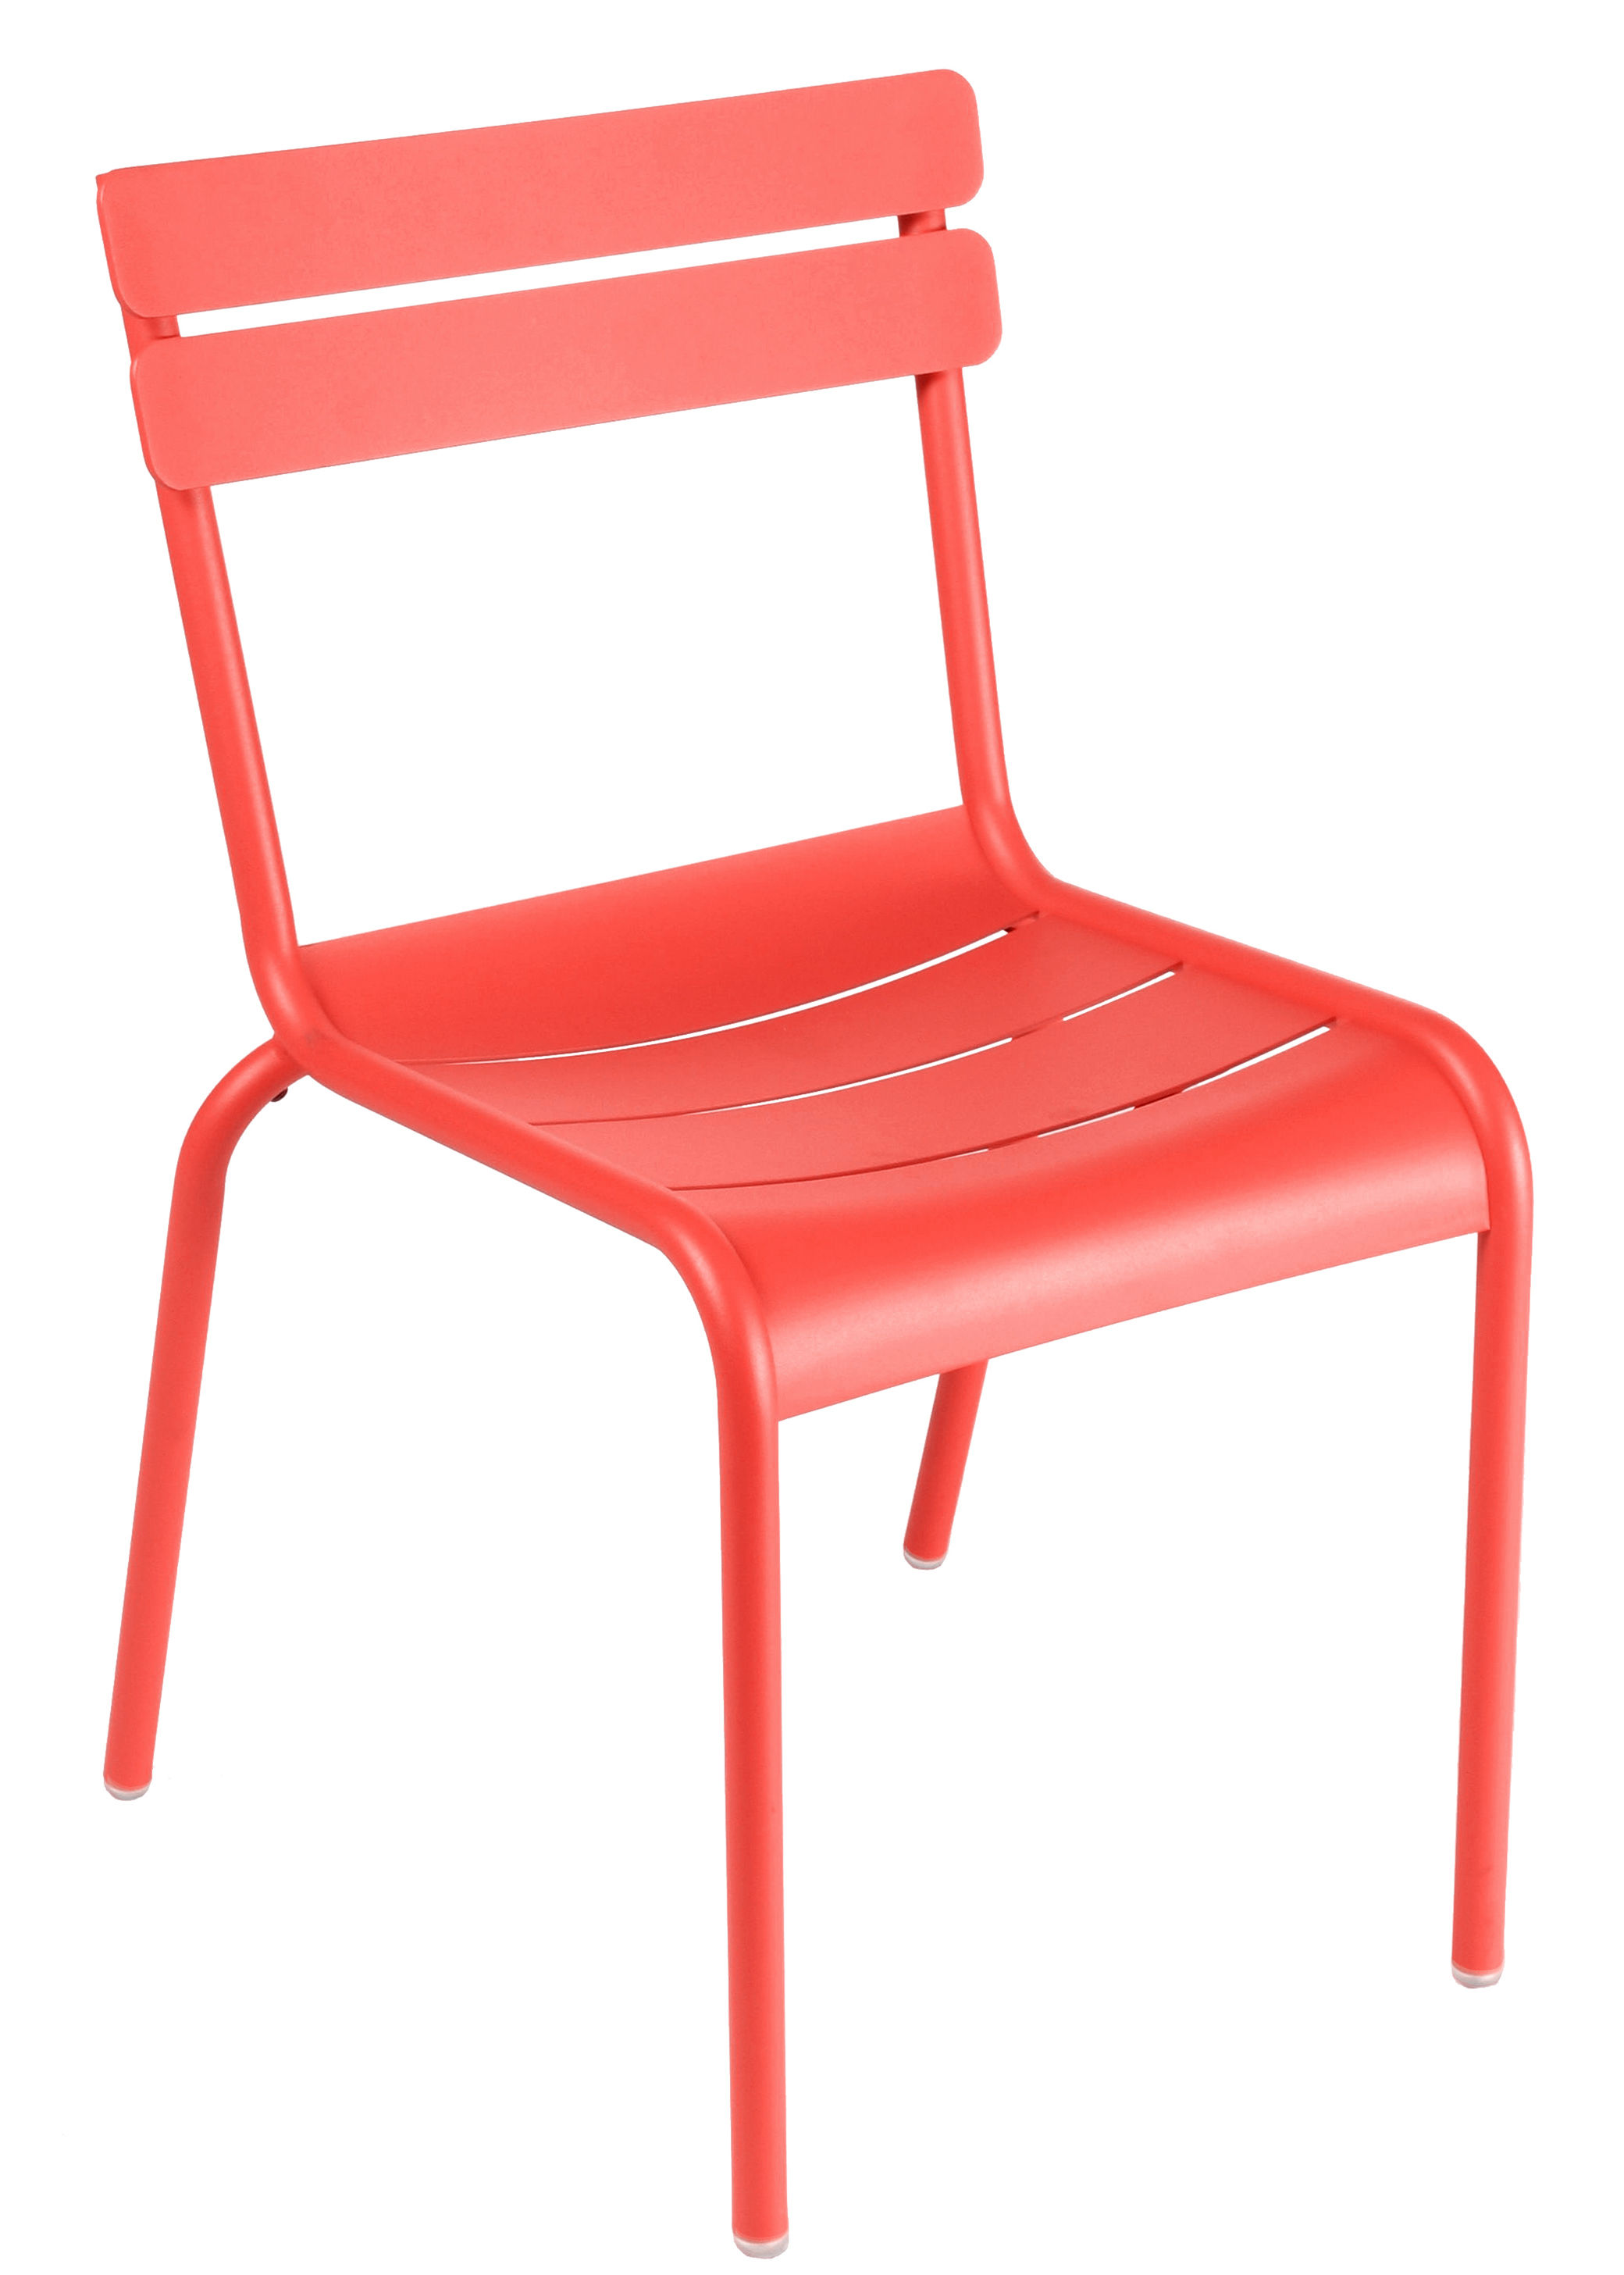 Life Style - Luxembourg Stapelbarer Stuhl - Fermob - Capucine - lackiertes Aluminium